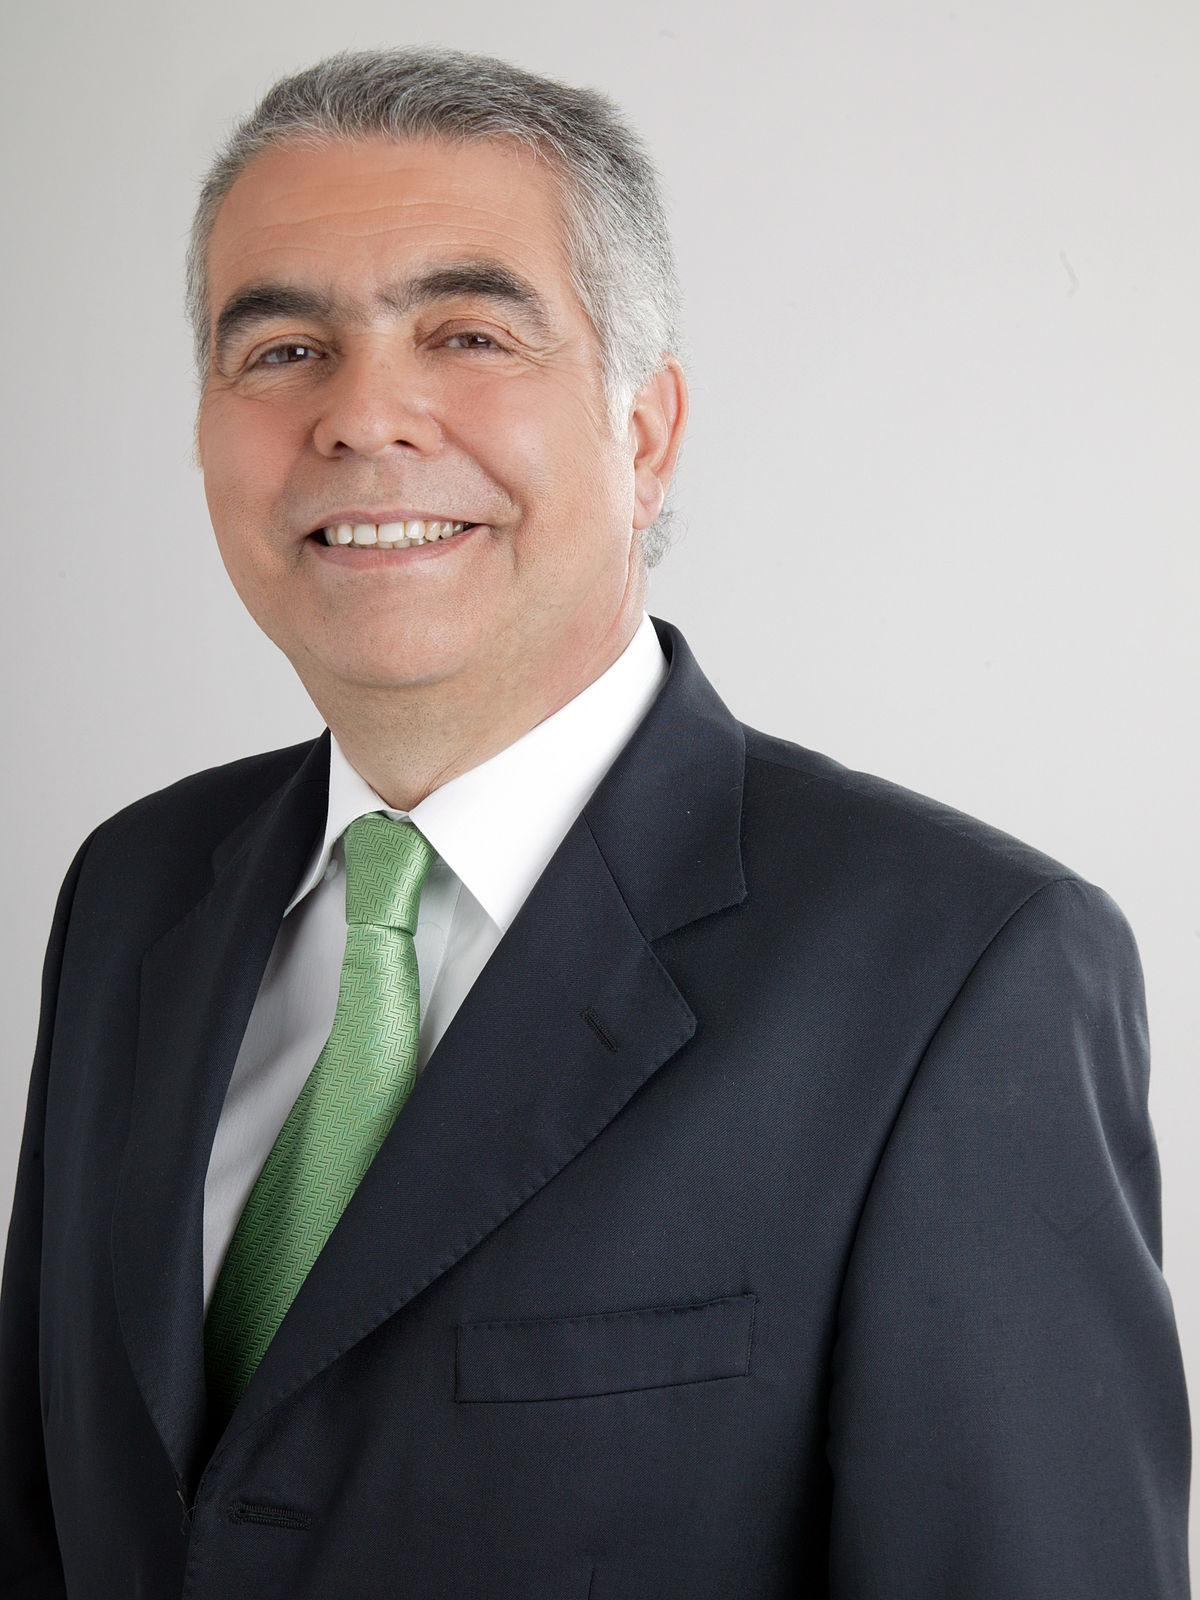 Alfonso vargas wikipedia la enciclopedia libre for Ingeniero arquitecto